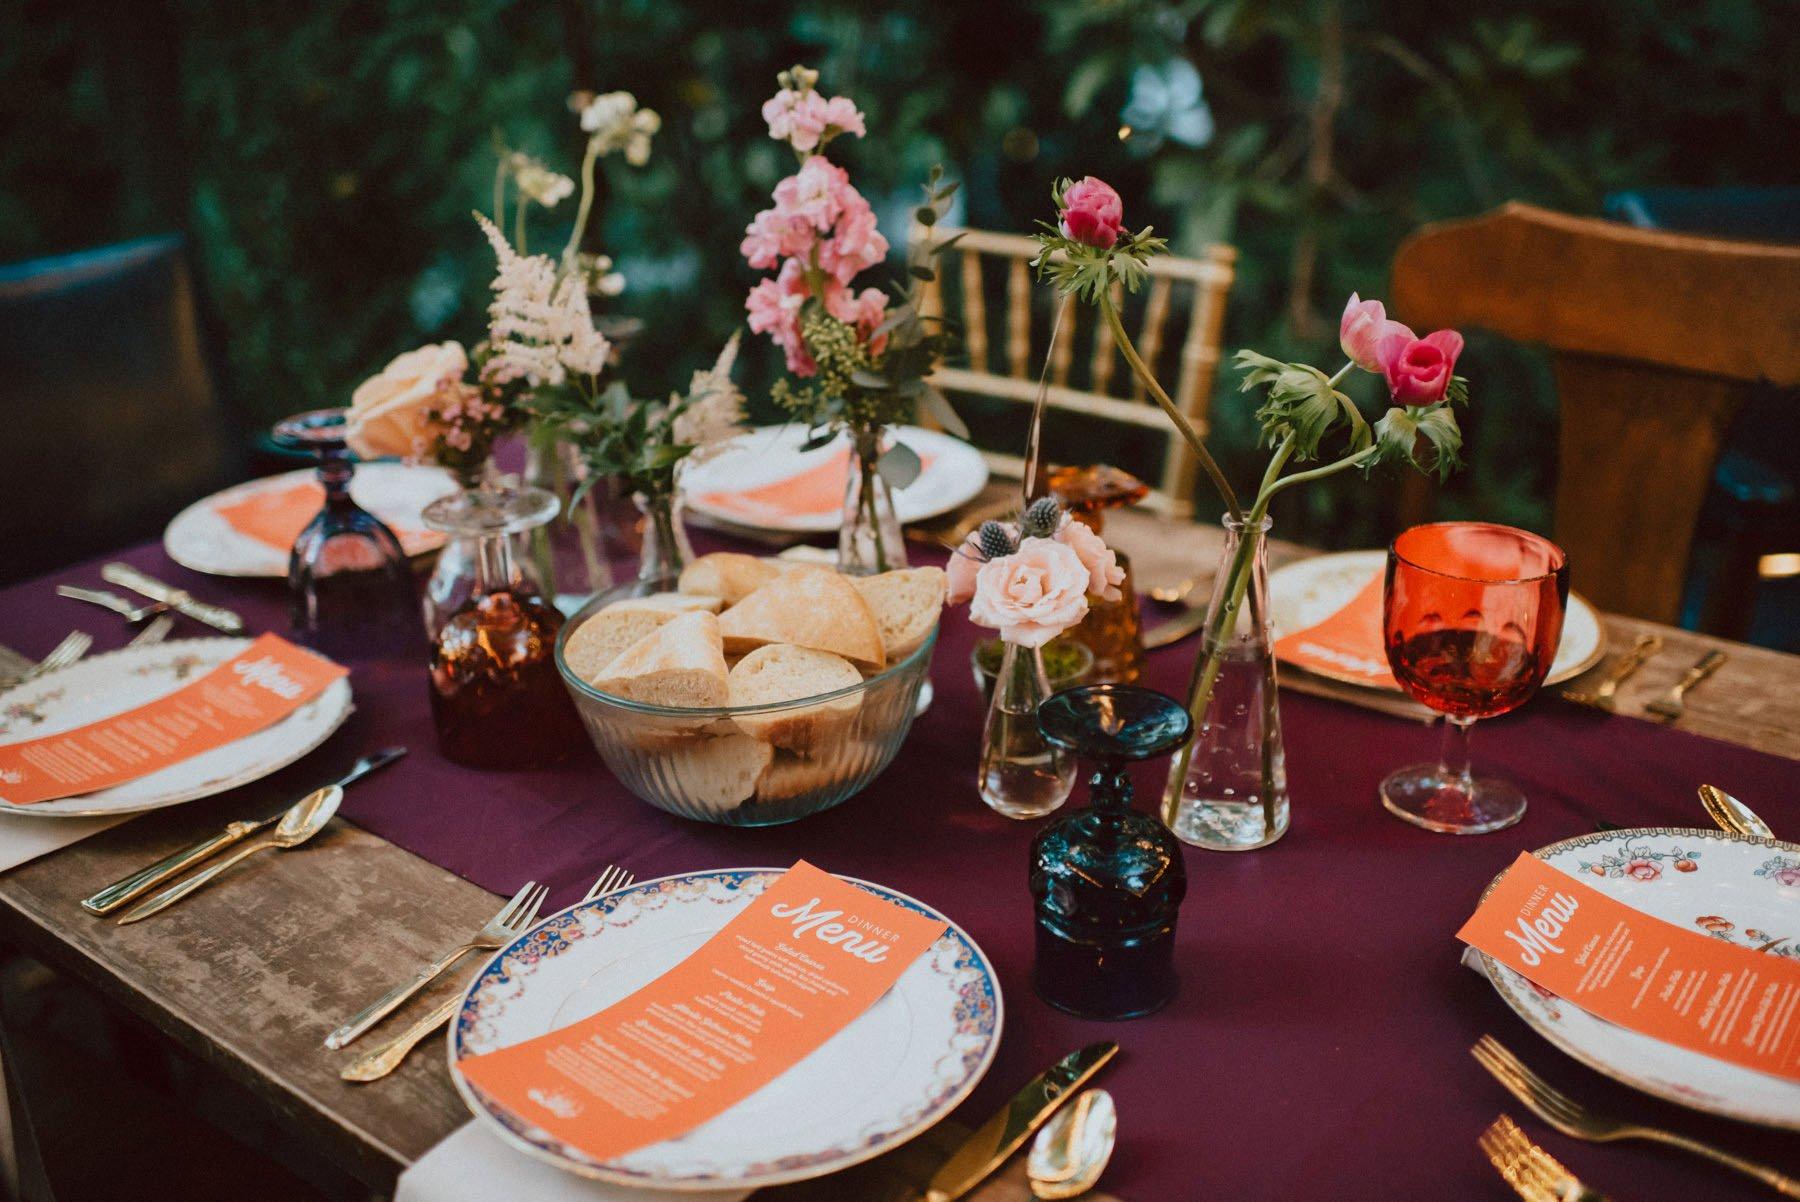 faunbrook-bed-and-breakfast-wedding-137.jpg